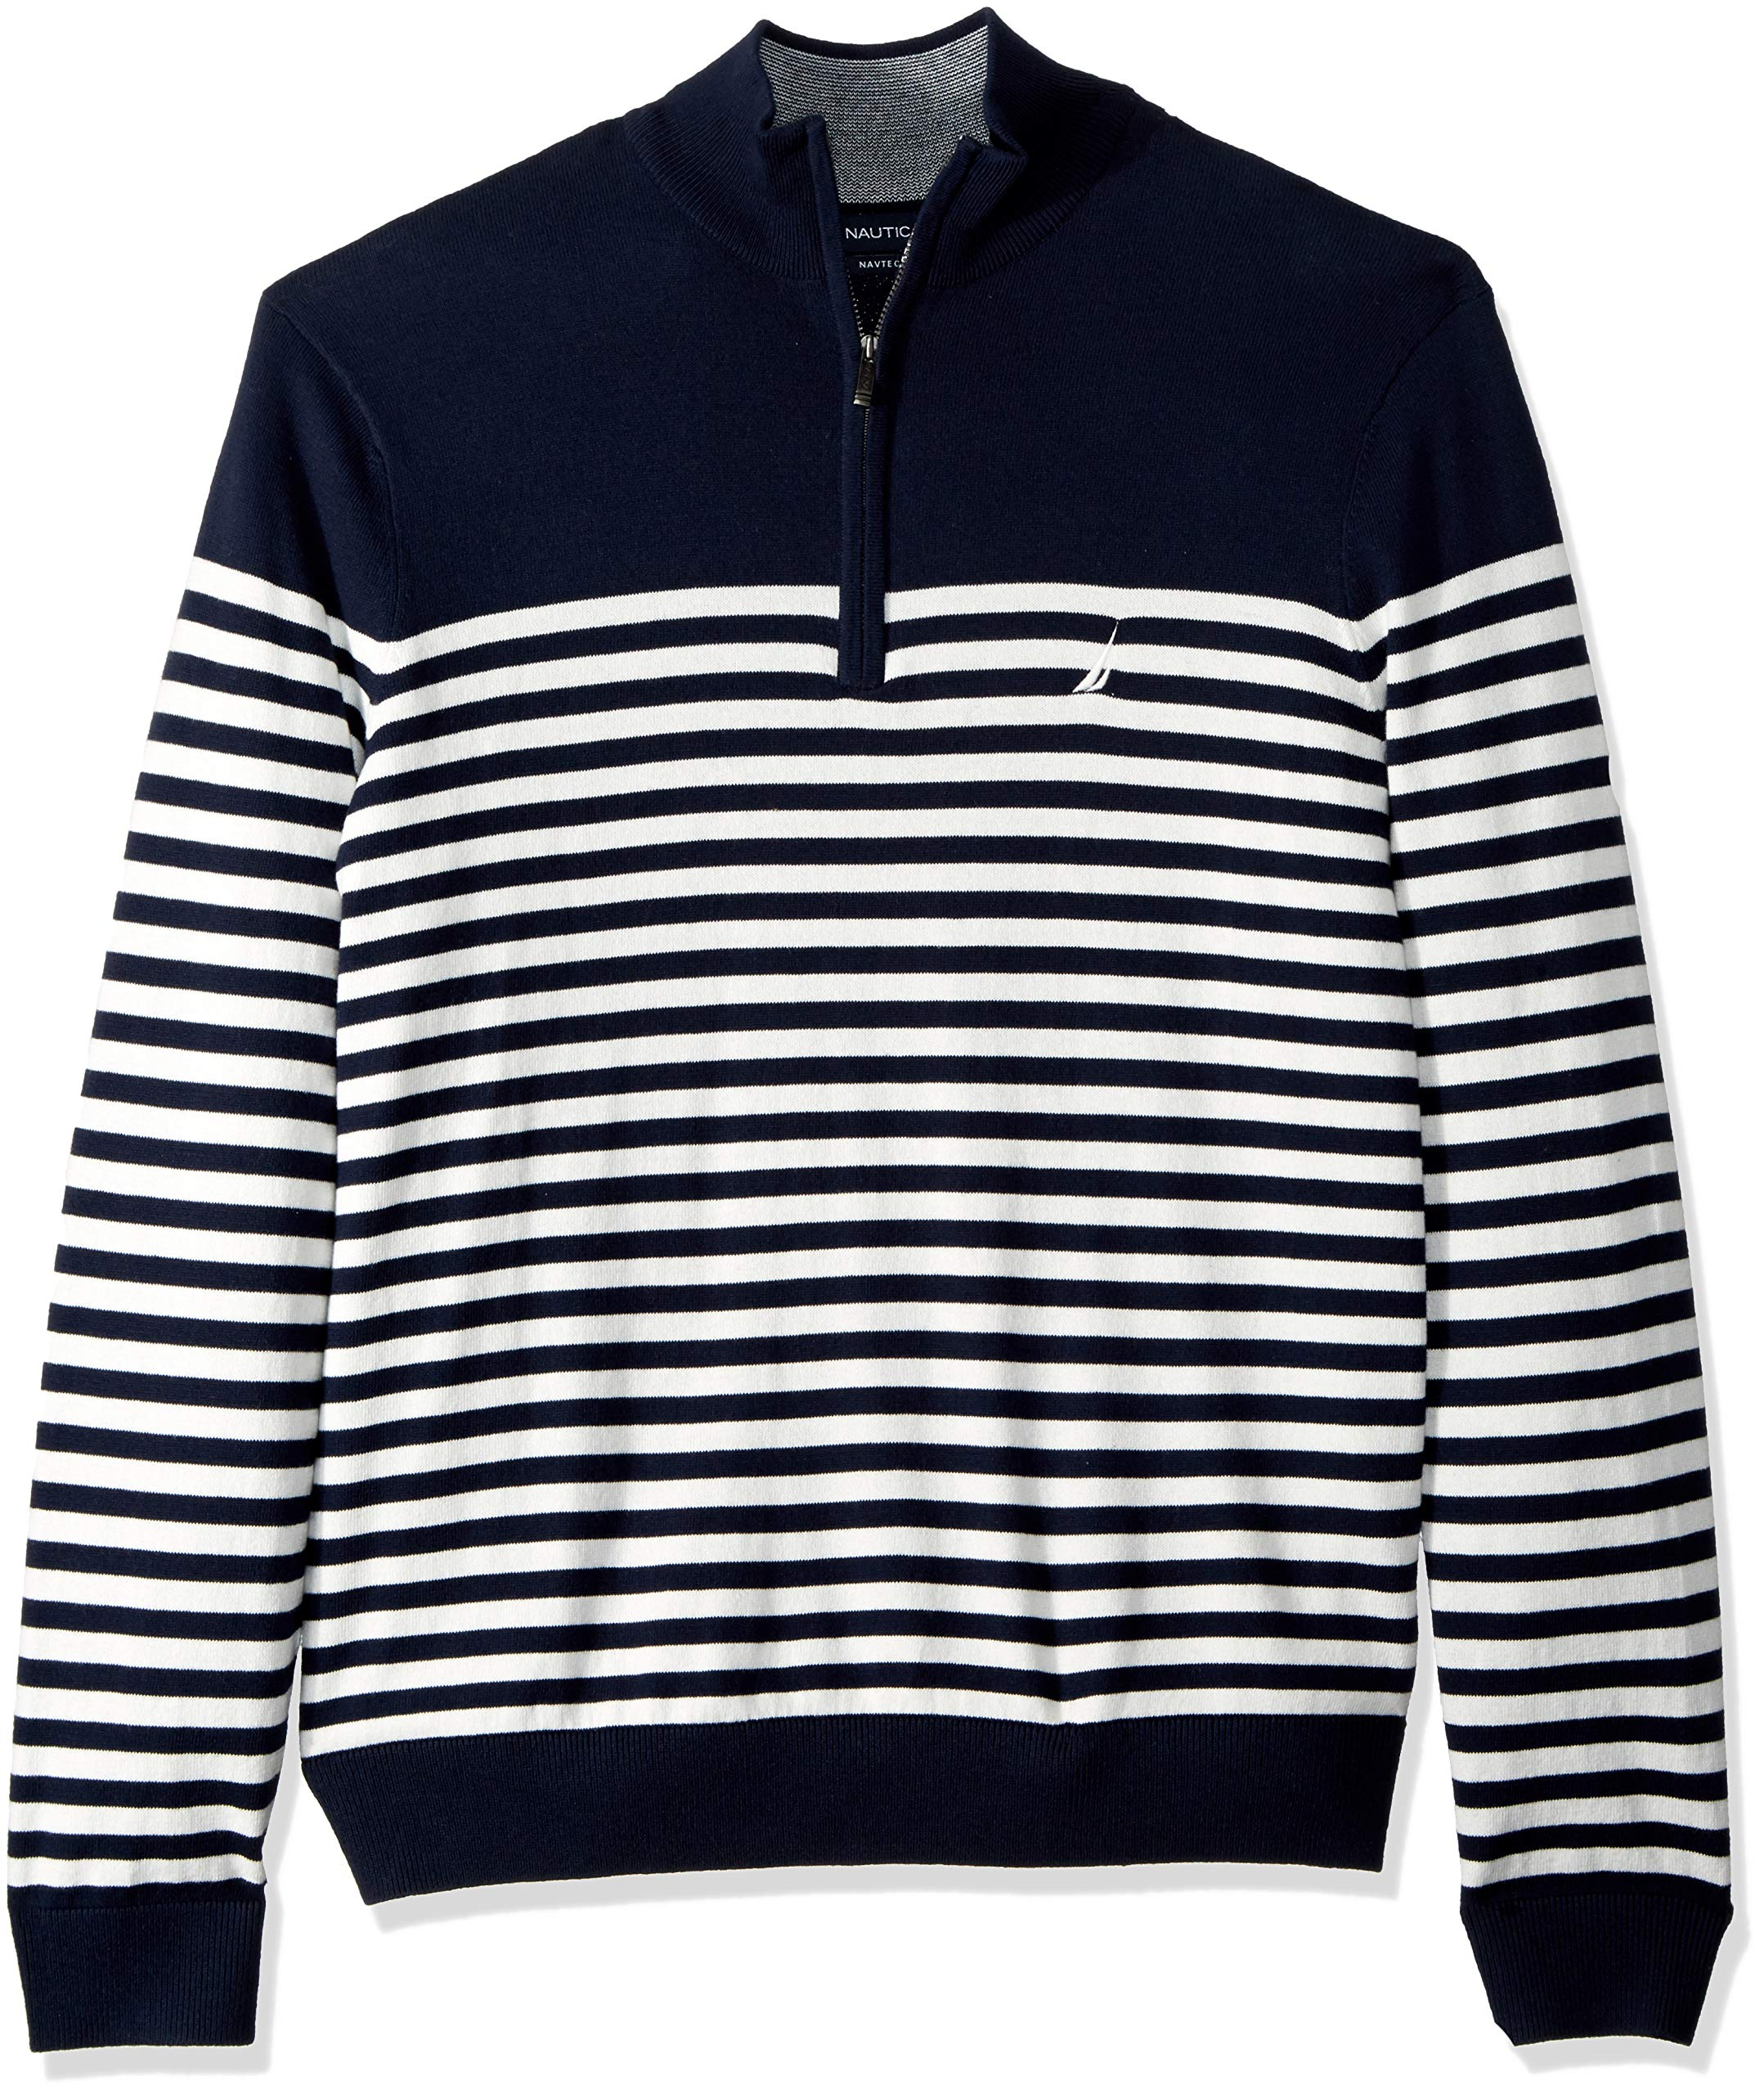 Nautica Men's Big and Tall Half-Zip Mock Neck Breton Sweater, Navy, 2X